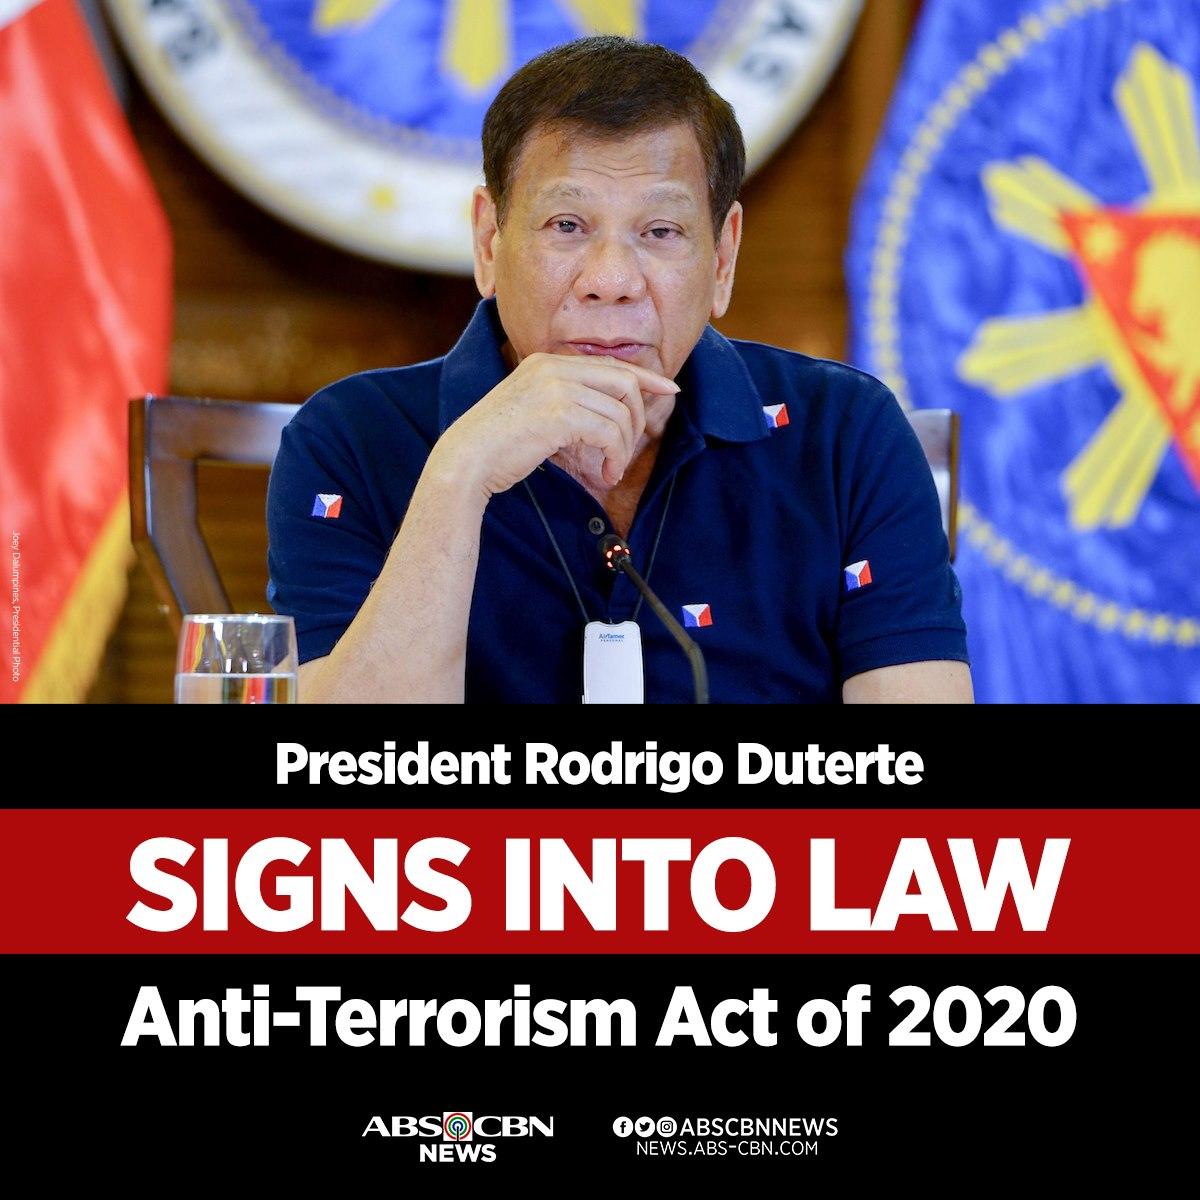 JUST IN: President Duterte has signed into law the Anti-Terrorism Act of 2020. | via @joycebalancio